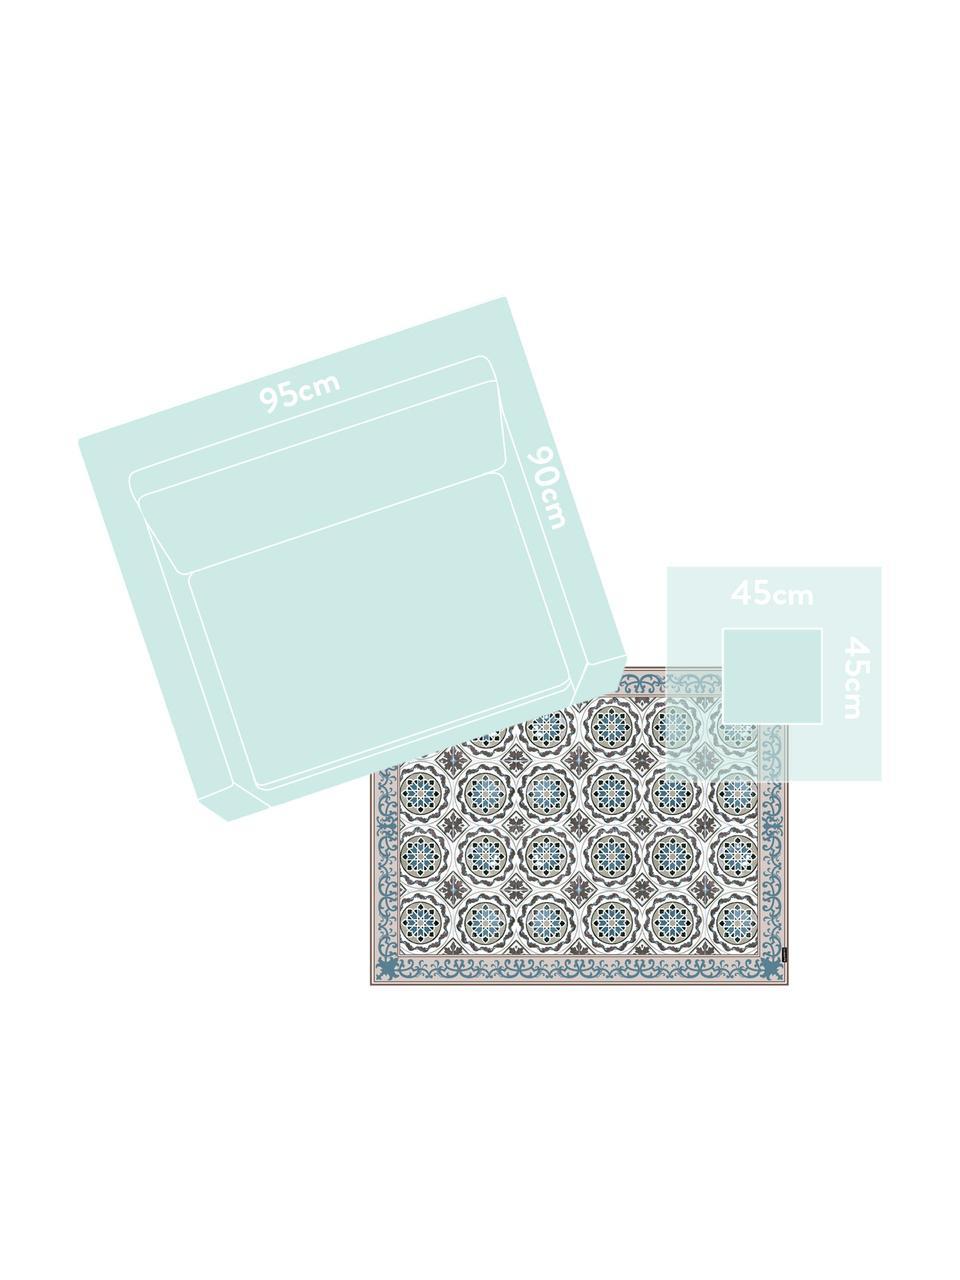 Flache Vinyl-Bodenmatte Selina in Beige/Blau, rutschfest, Vinyl, recycelbar, Beige, Braun, Blau, 65 x 85 cm